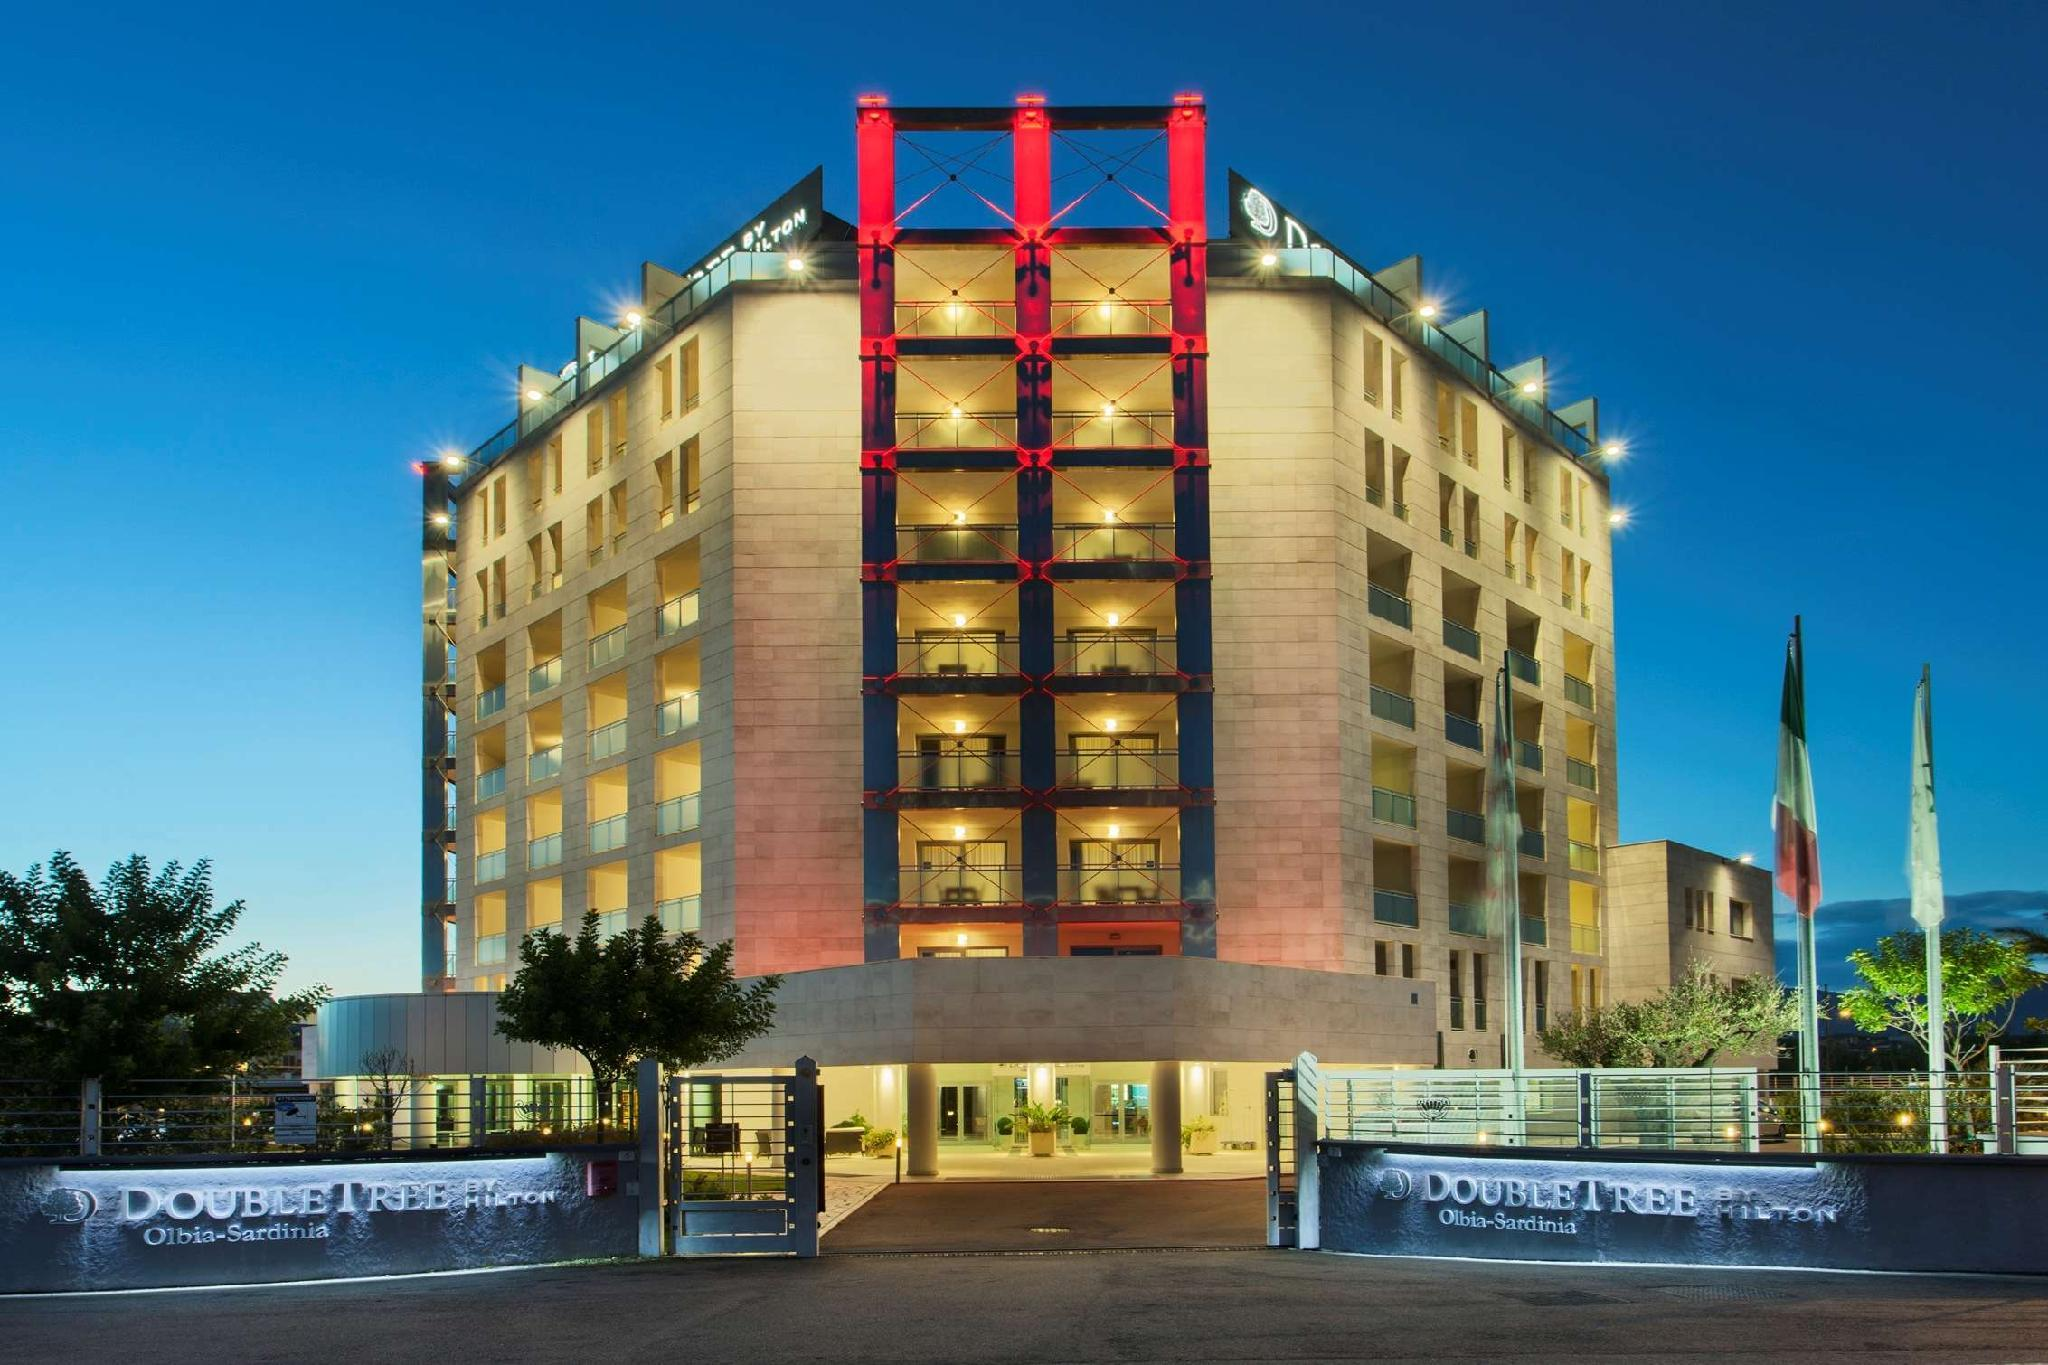 Doubletree By Hilton Olbia   Sardinia Hotel